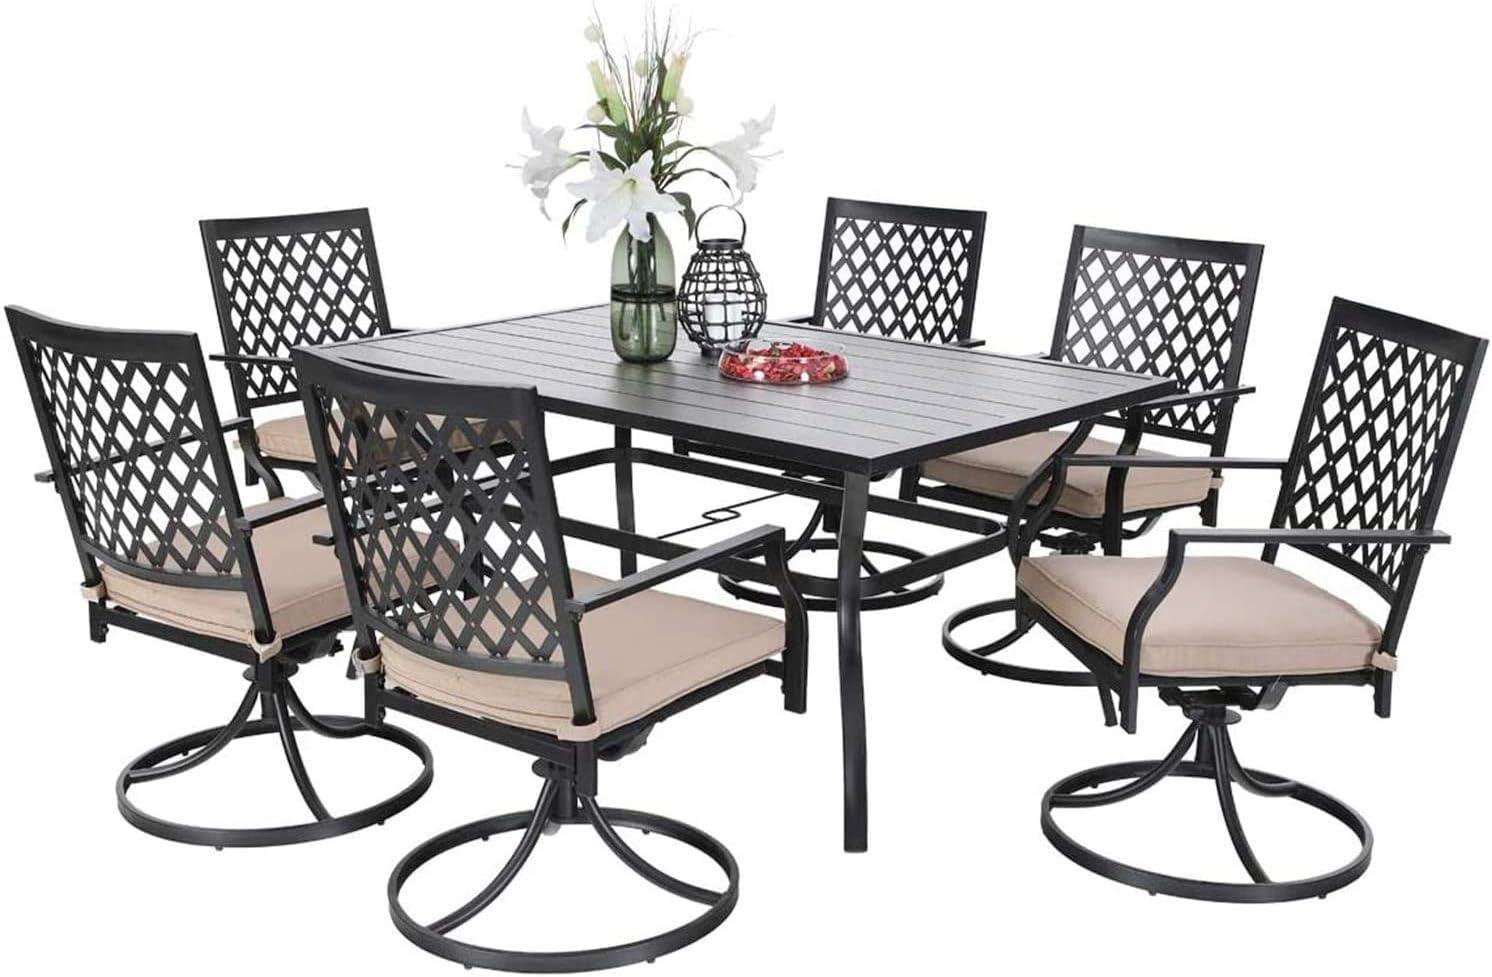 Buy PHI VILLA Outdoor Patio Dining Set of 10 Metal Furniture Set, 10 ...